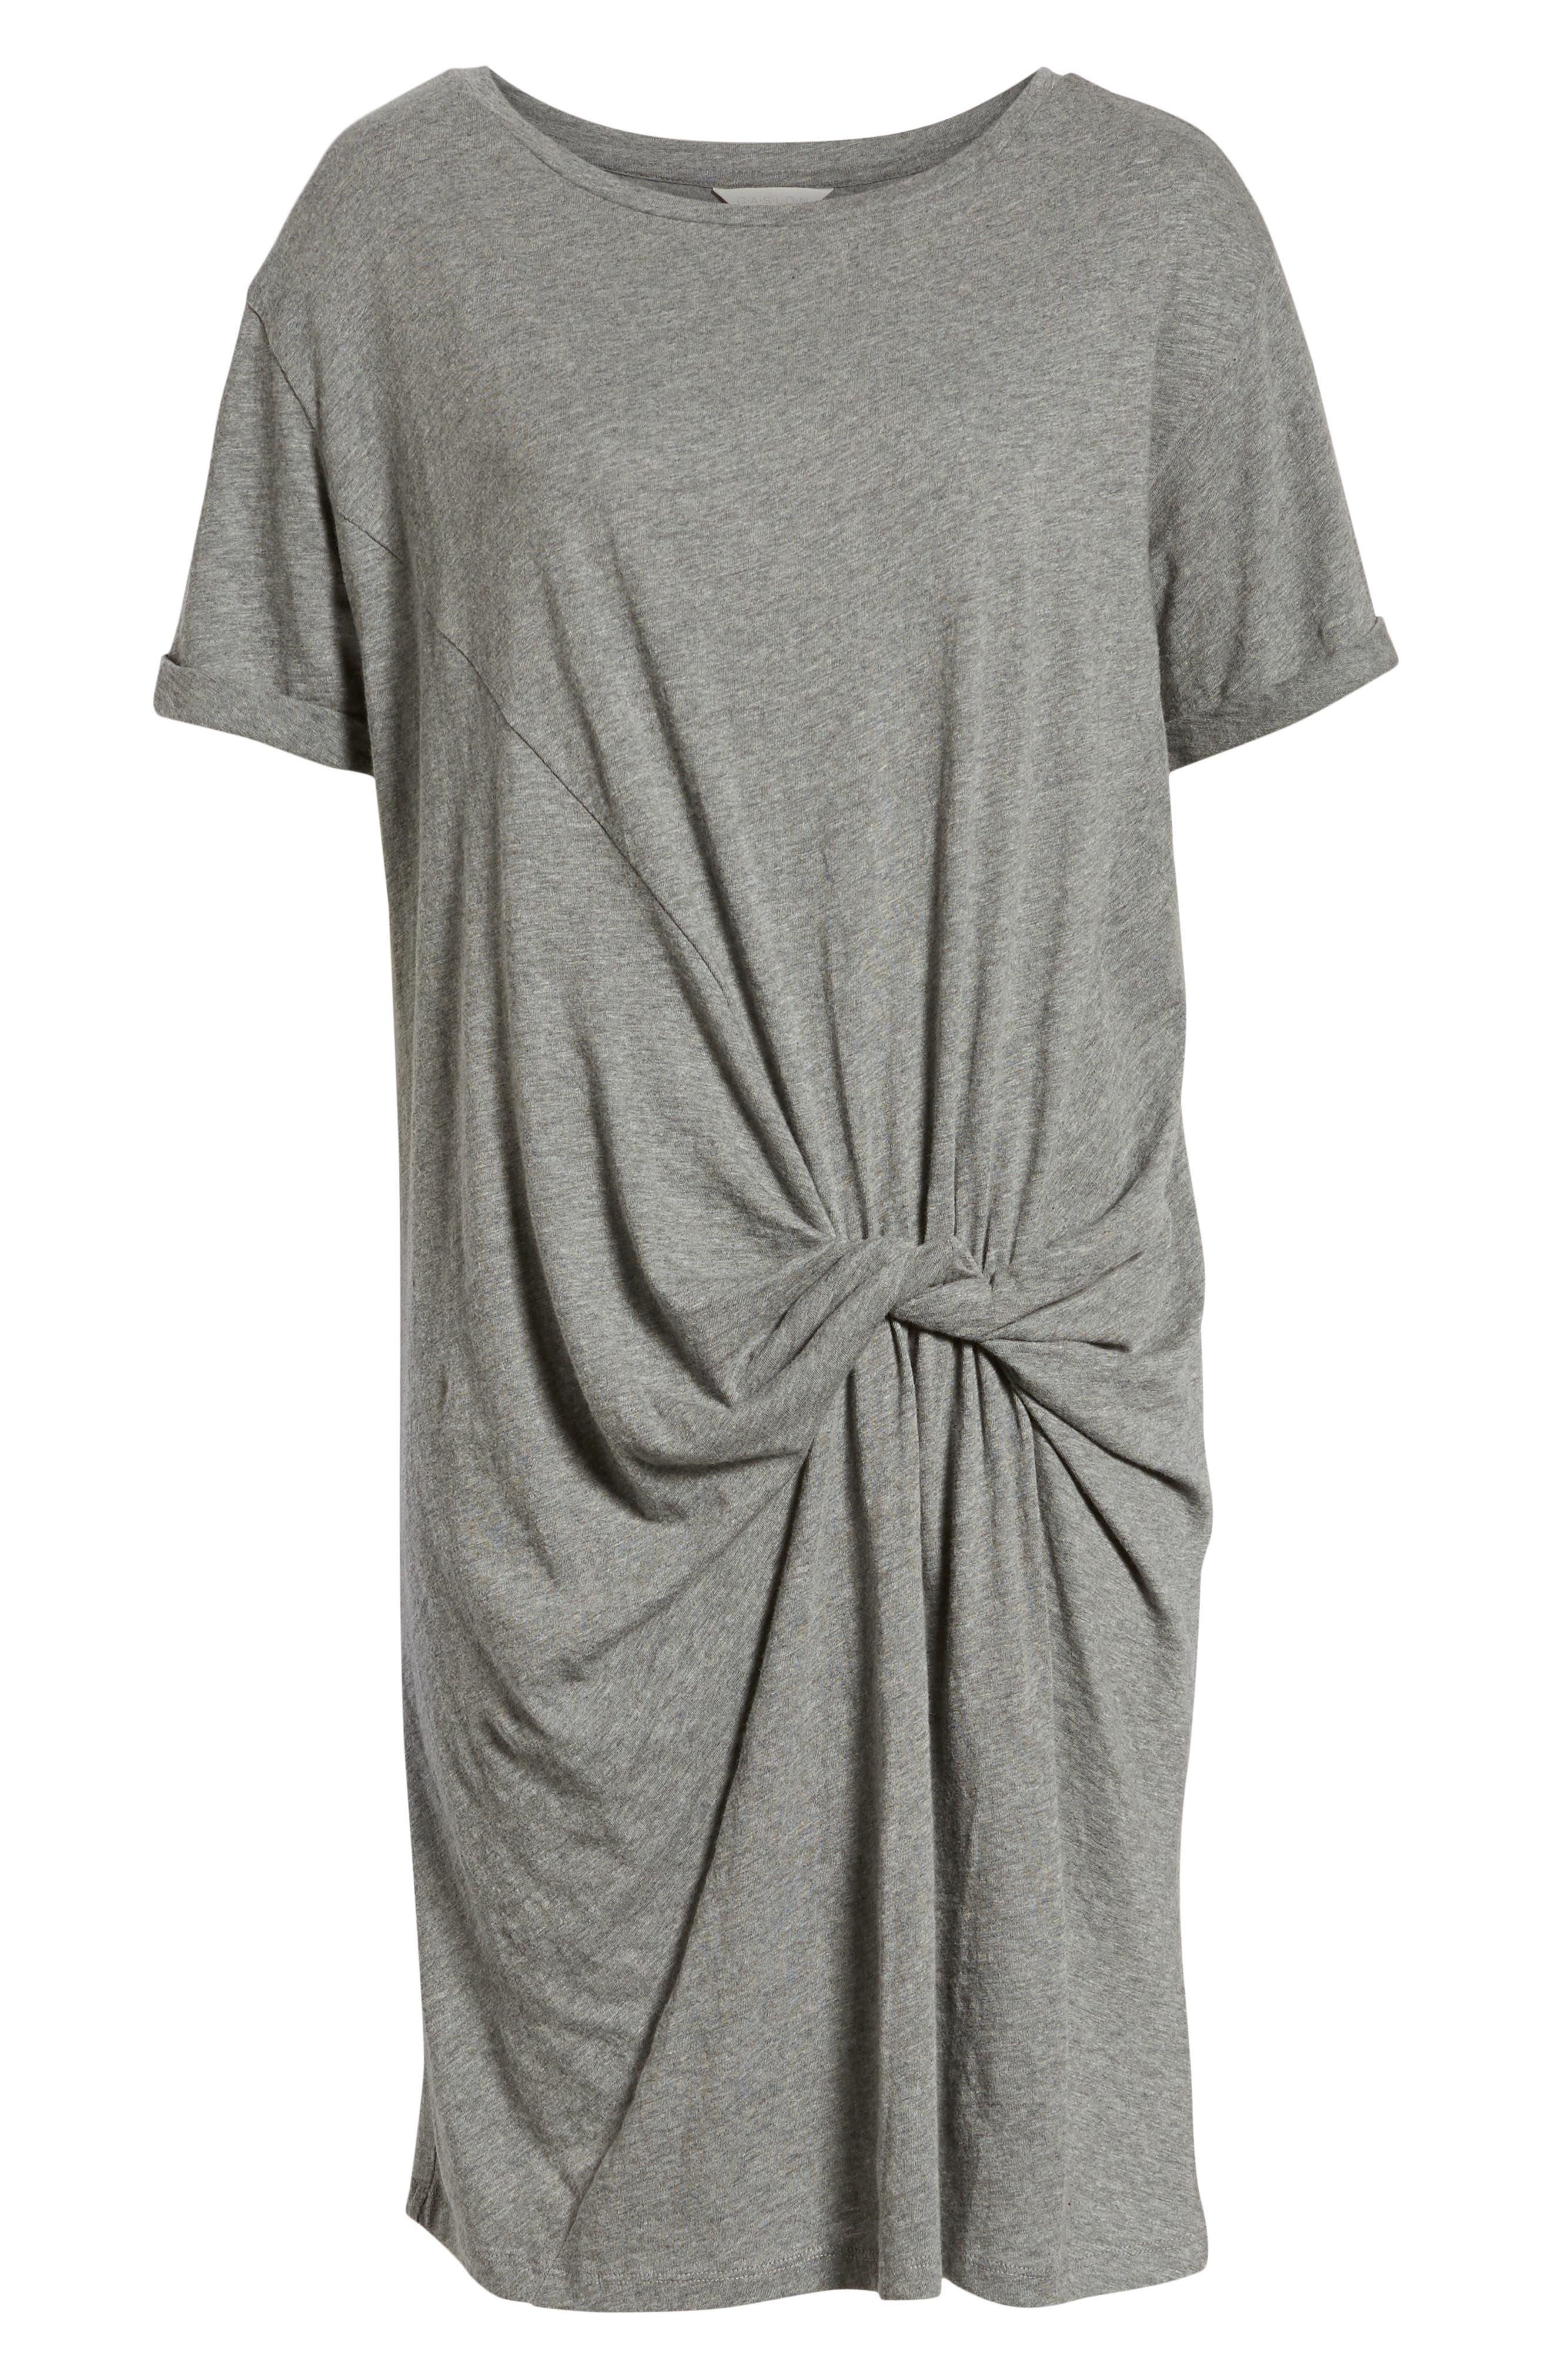 Knot Front T-Shirt Dress,                             Alternate thumbnail 7, color,                             GREY DARK HEATHER